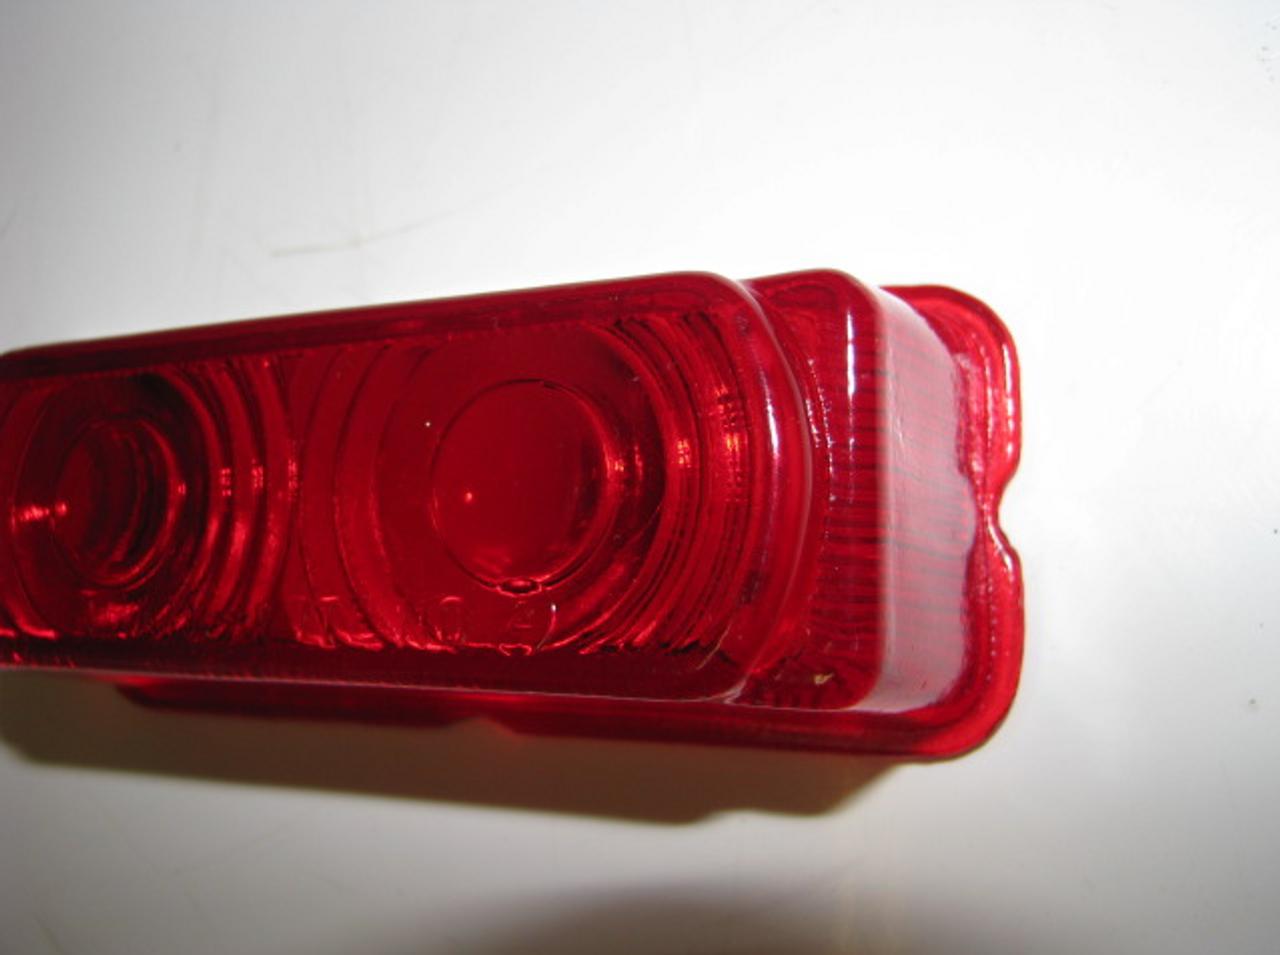 Reproduction Bargman #2 Taillight Lens (CLT057)